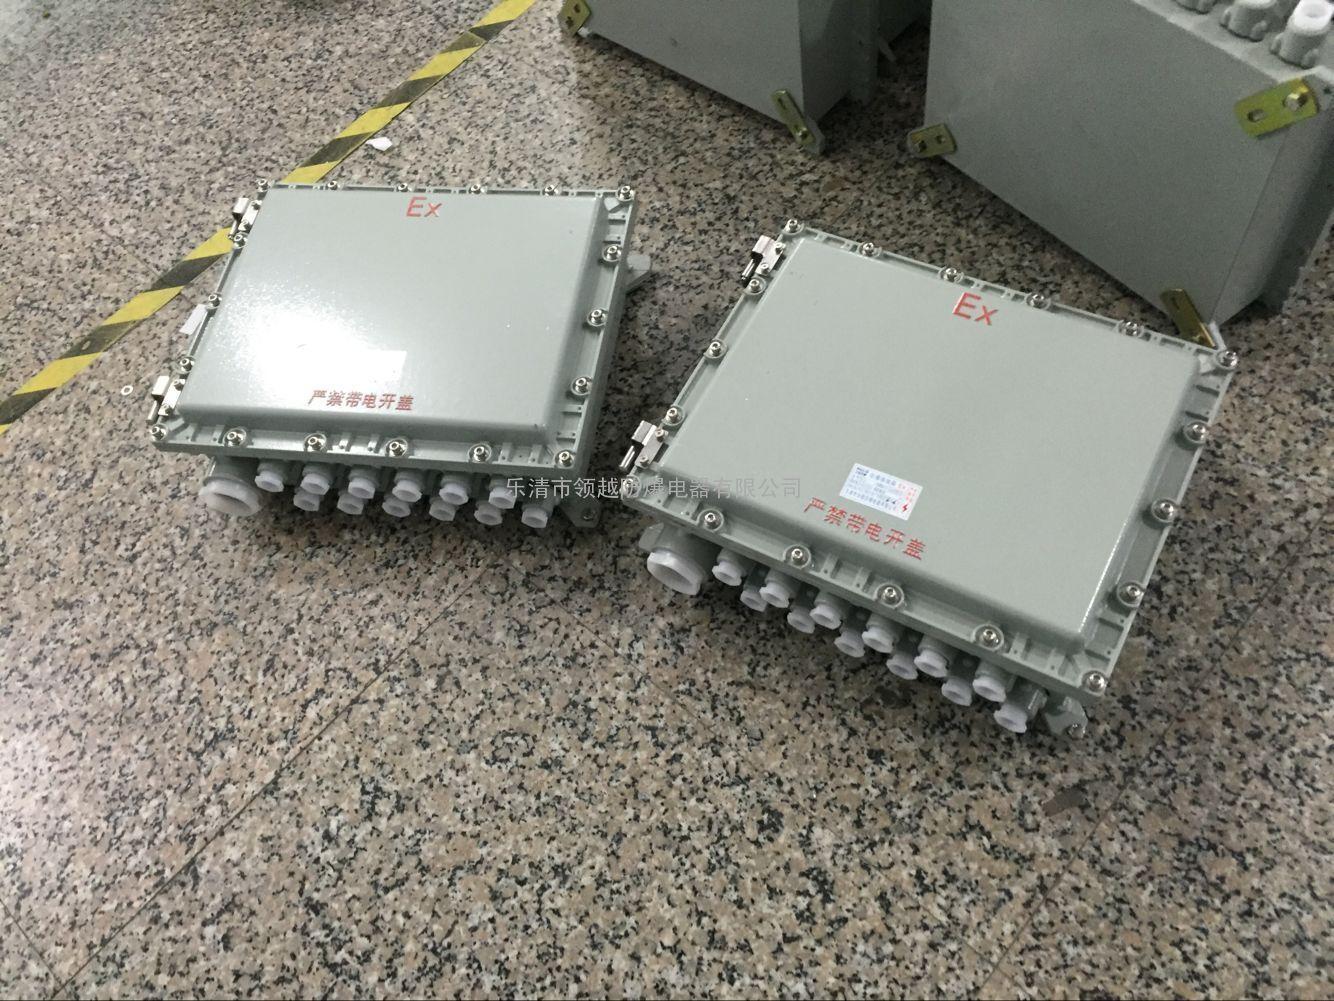 jh-bjx-wf1防爆接线箱_铝合金防爆接线箱 防爆端子箱